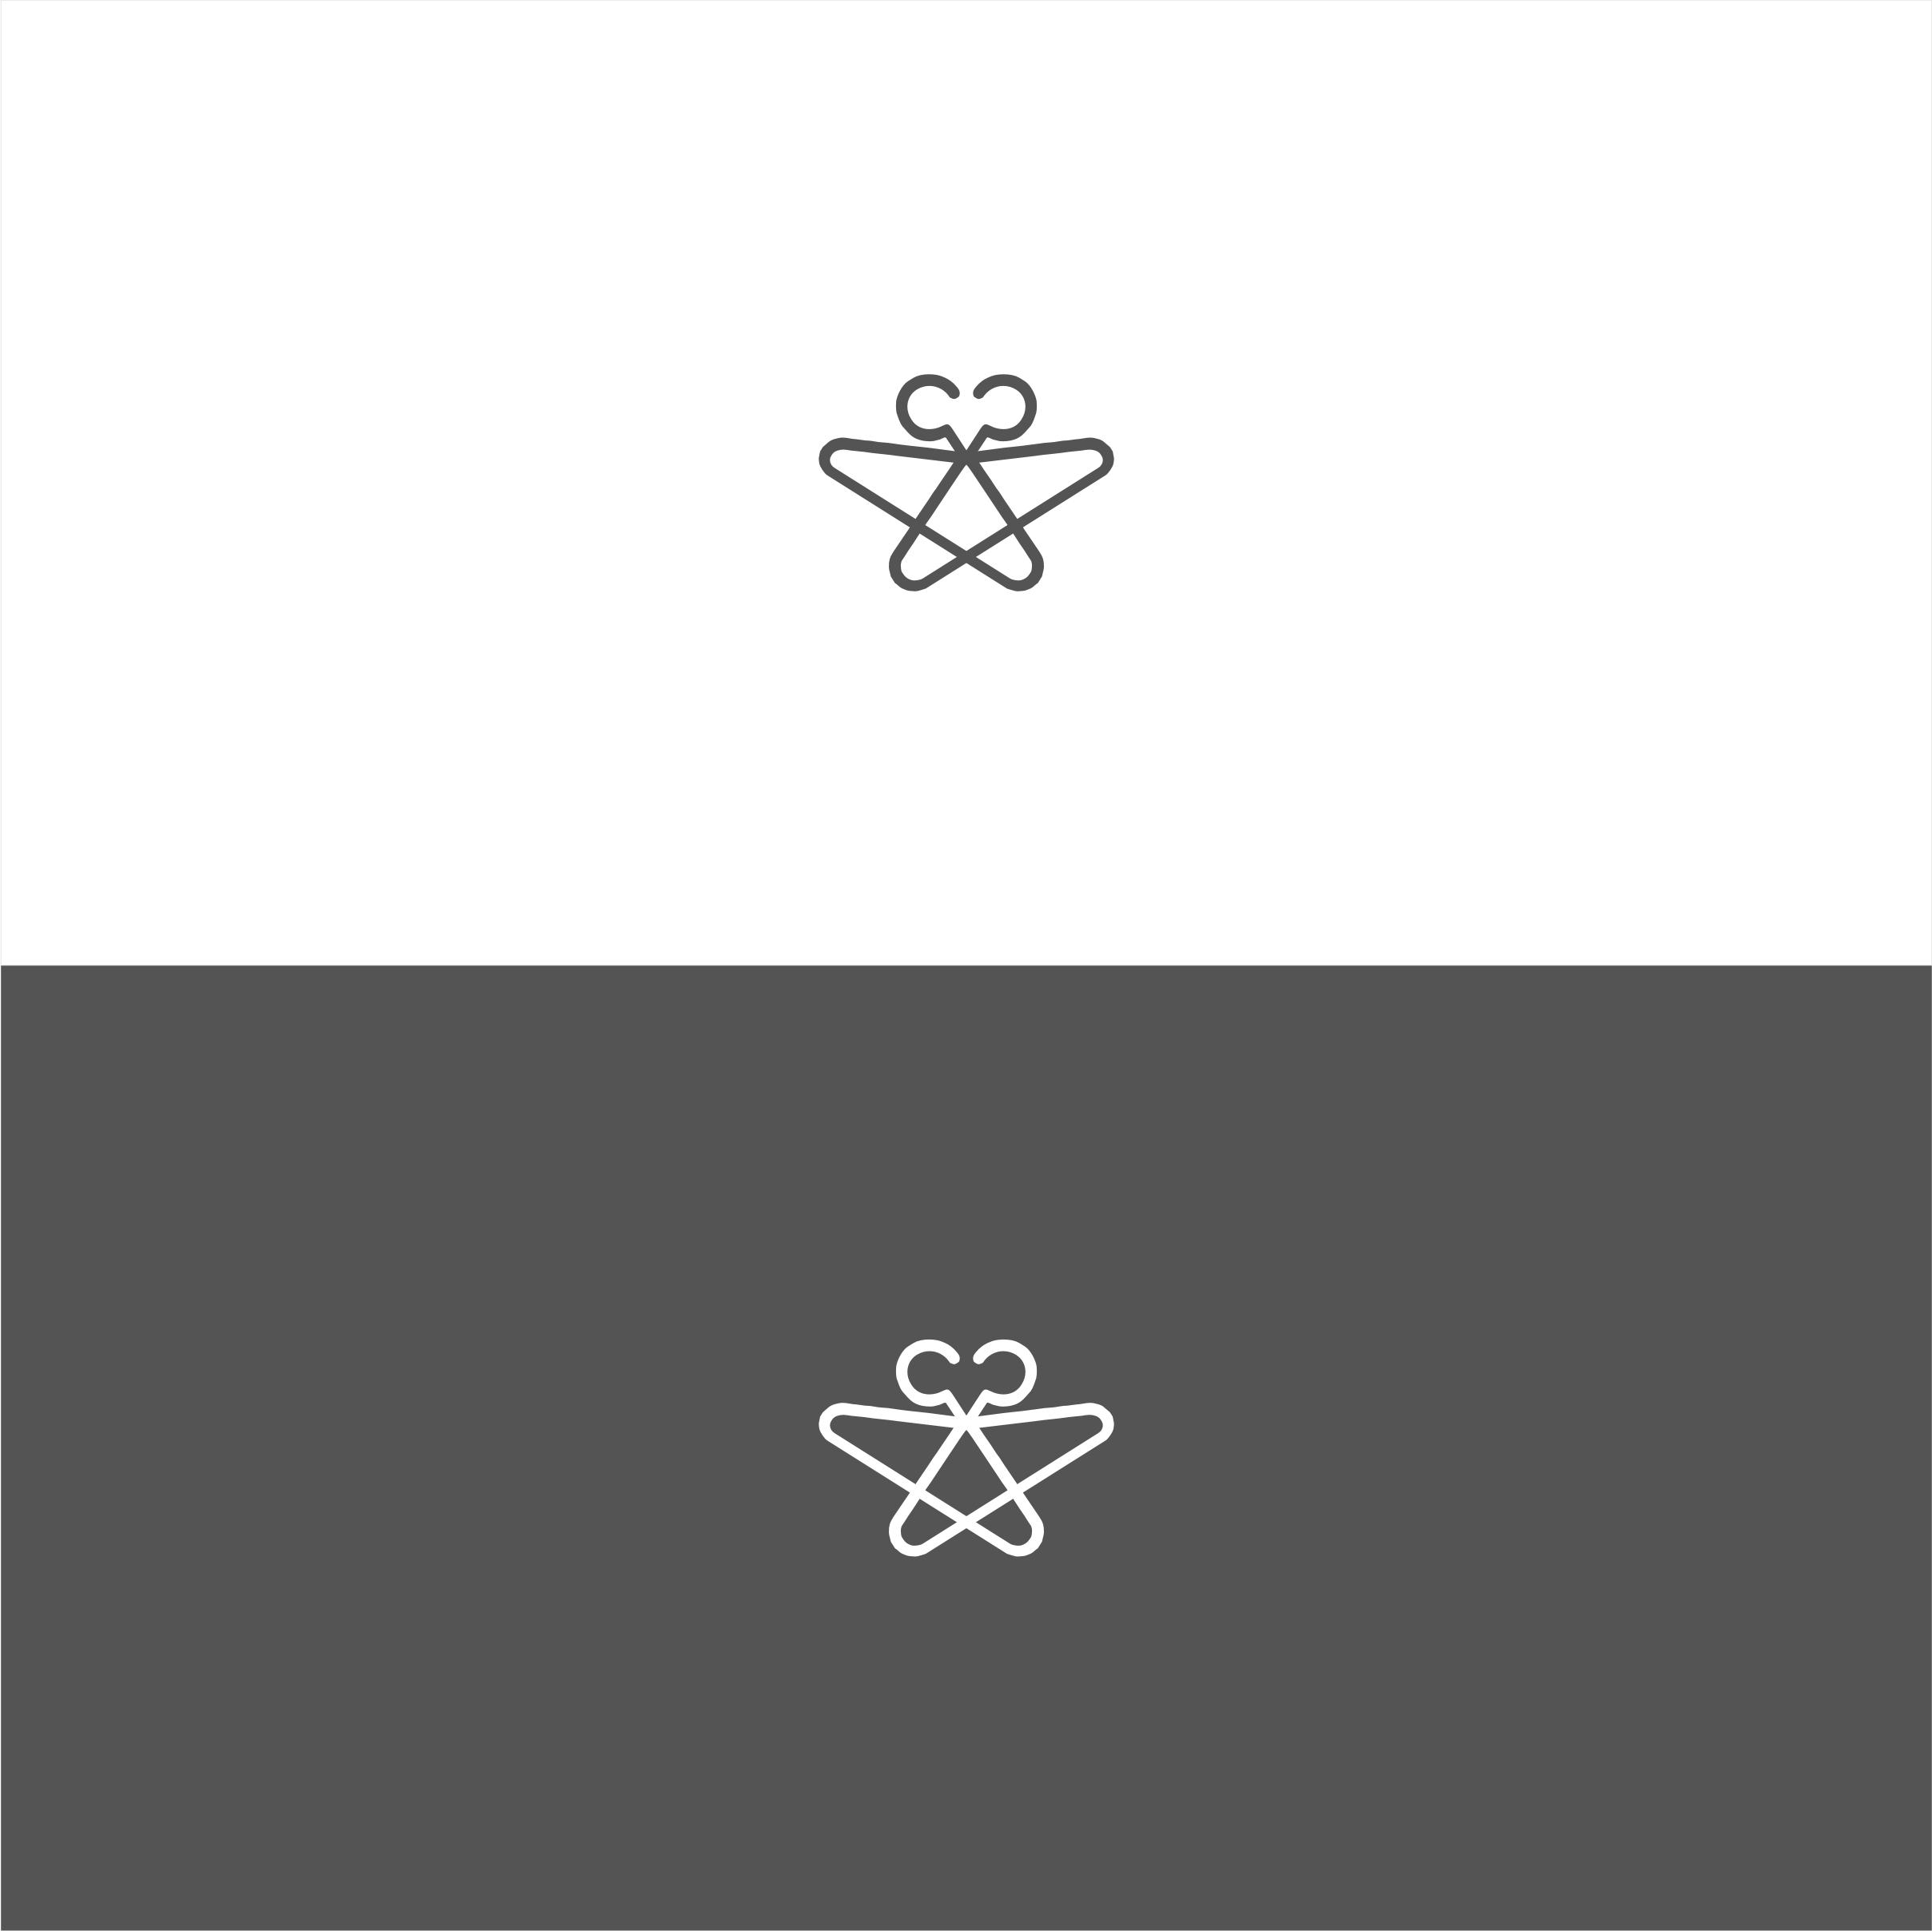 Логотип, фавикон и визитка для компании Винком Пласт  фото f_8375c38cb1fea11f.jpg